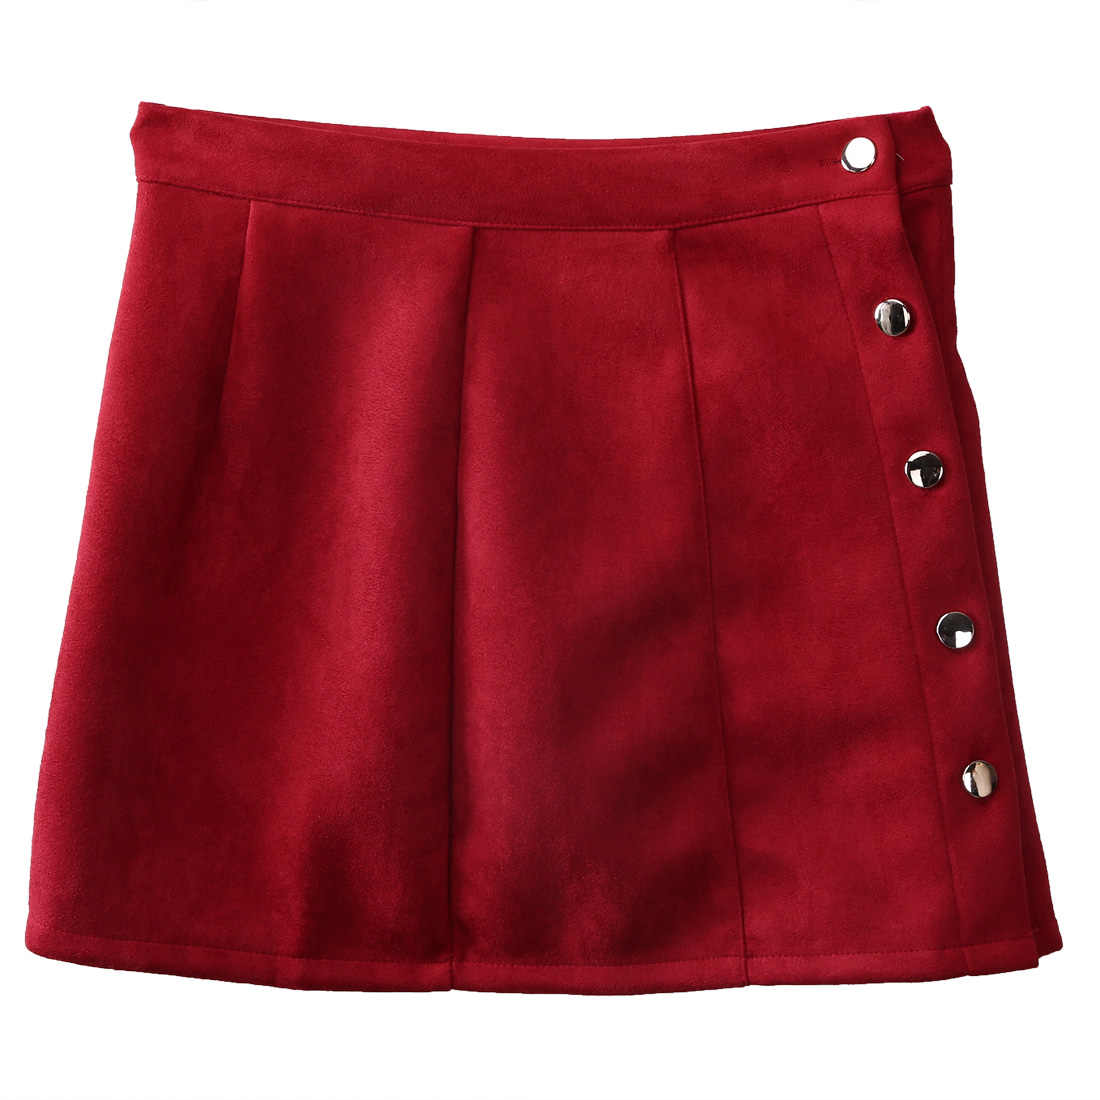 Nuove Donne di Modo A Vita Alta In Pelle Scamosciata In Pelle Gonne Preppy Breve Mini Gonna Donne Alla Moda di Inghilterra Stile di Una Linea di Mini Gonne